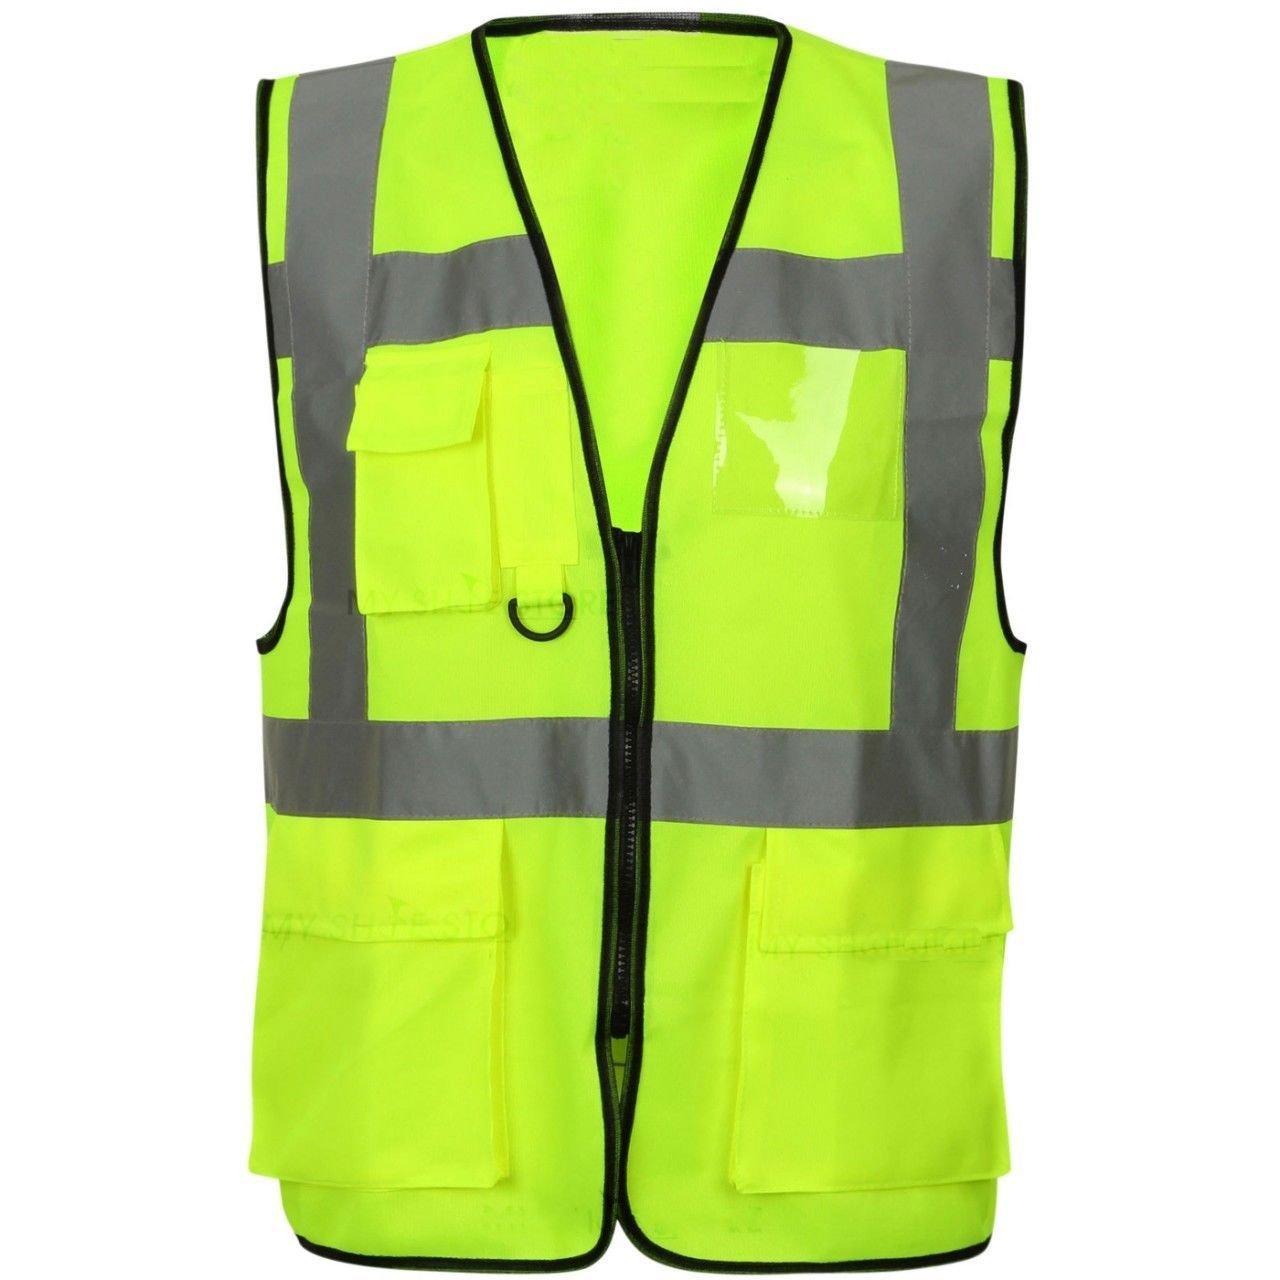 Overdose® Hi Viz Executive Vest High Visibility Work Waistcoat Mens Gillet Shirt Reflective Tape Safety Security Work Wear Ladies Vis Safety Top